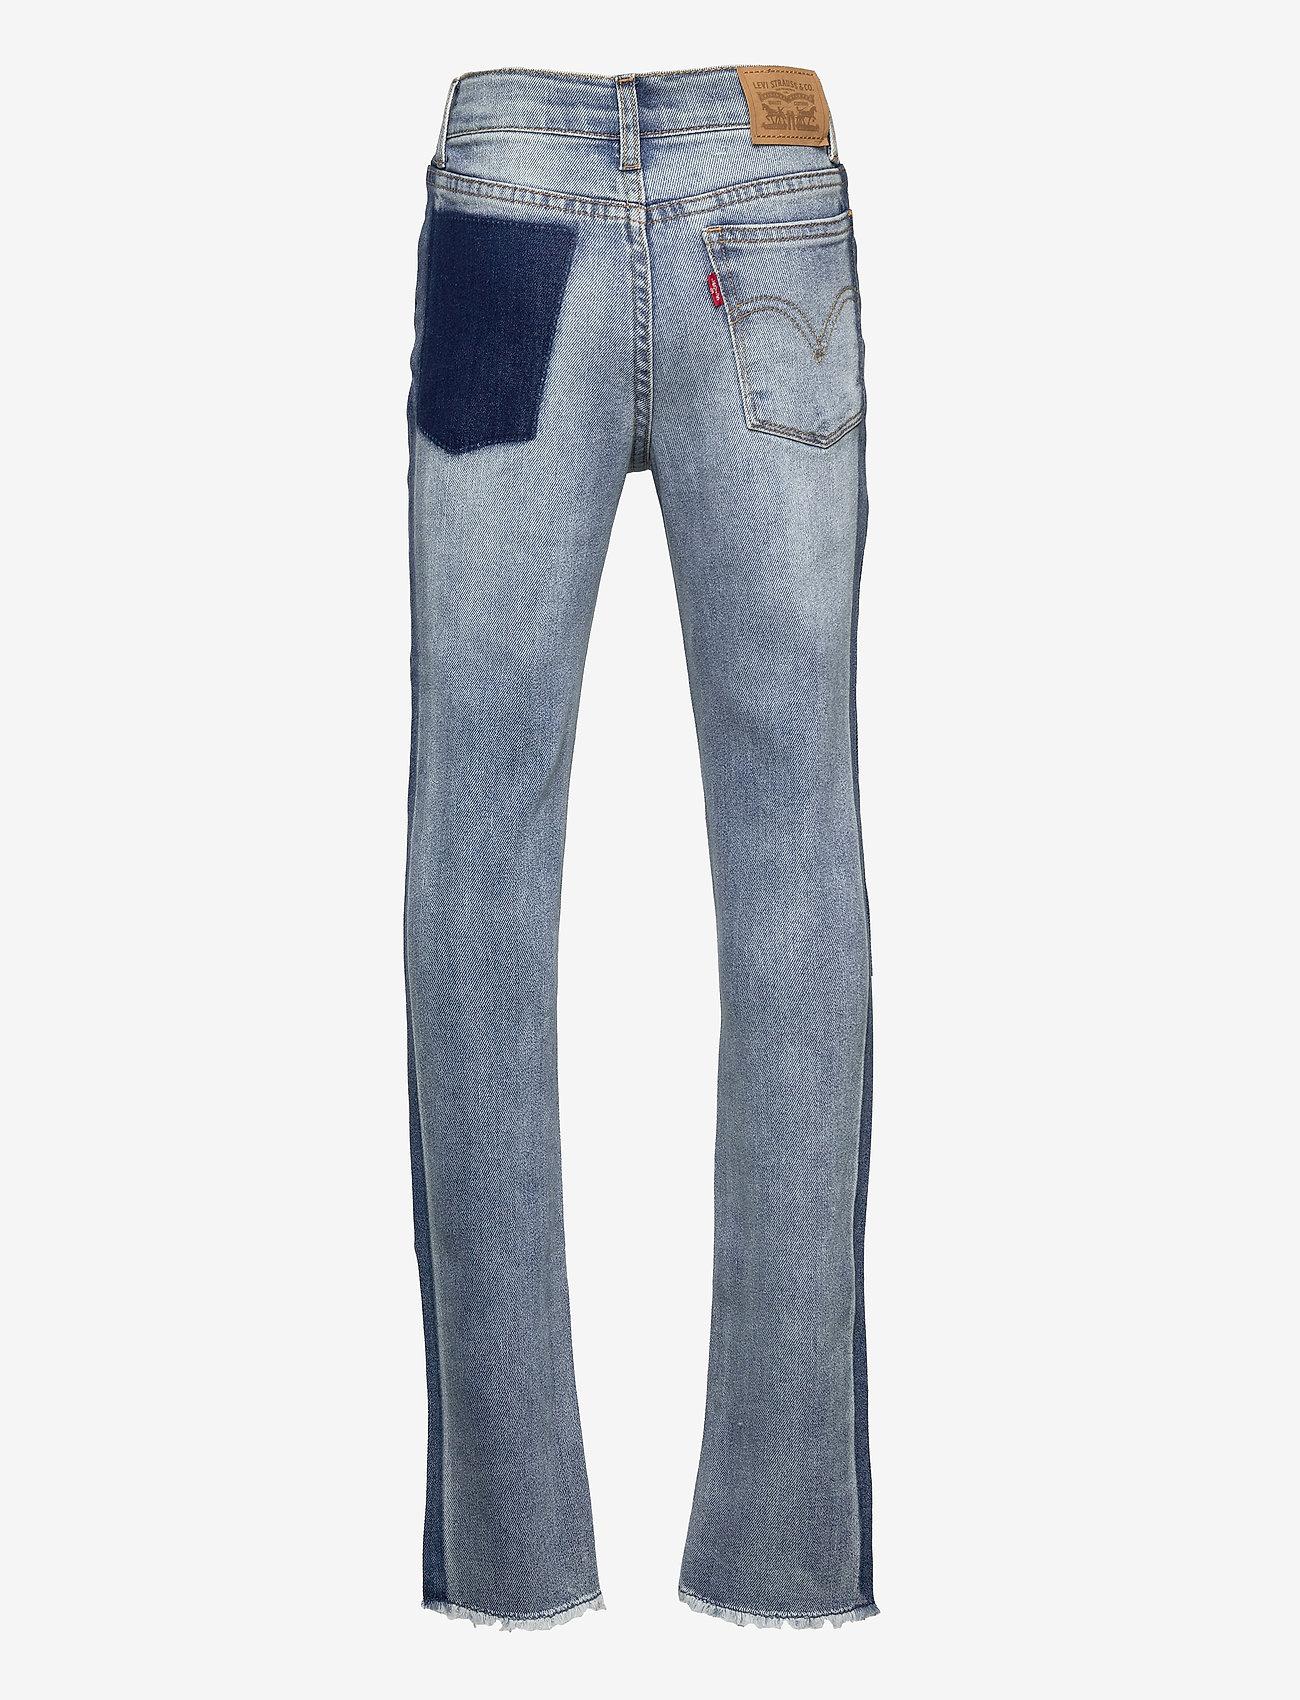 Levi's - GIRLFRIEND JEANS - jeans - gemini - 1